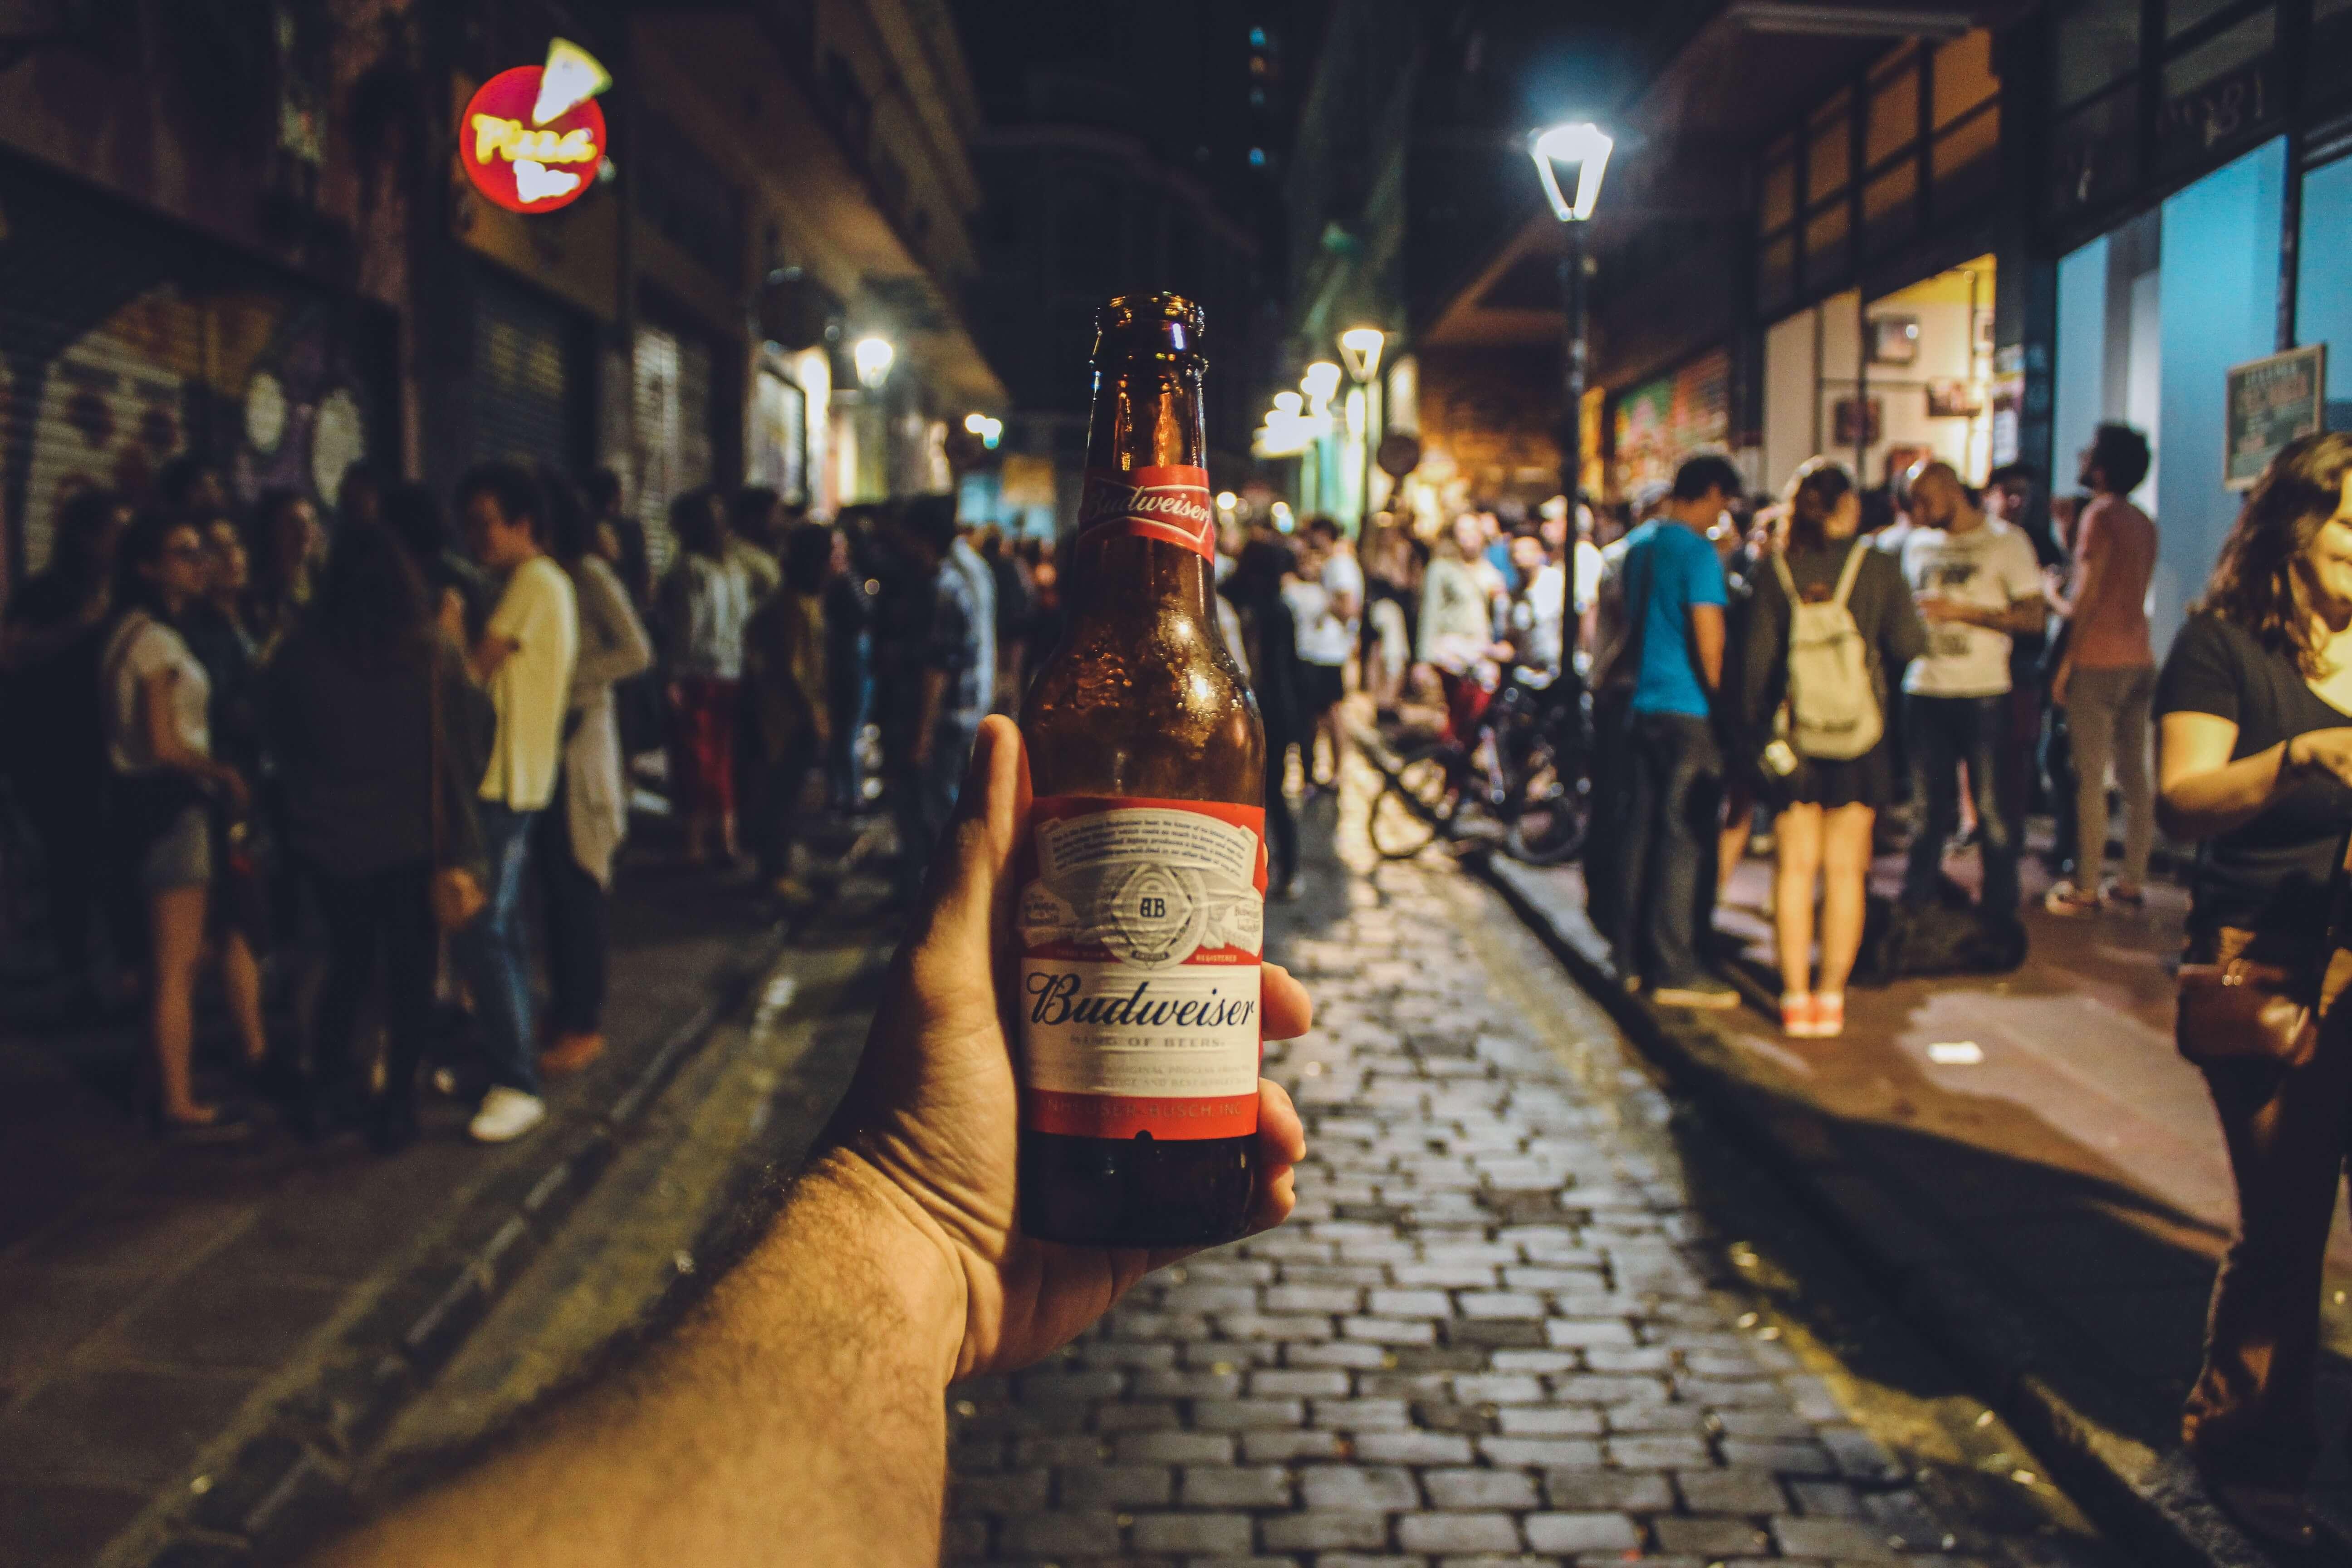 17.10. – Bulle, Bär & Bier – Infoabend und Pub Crawl